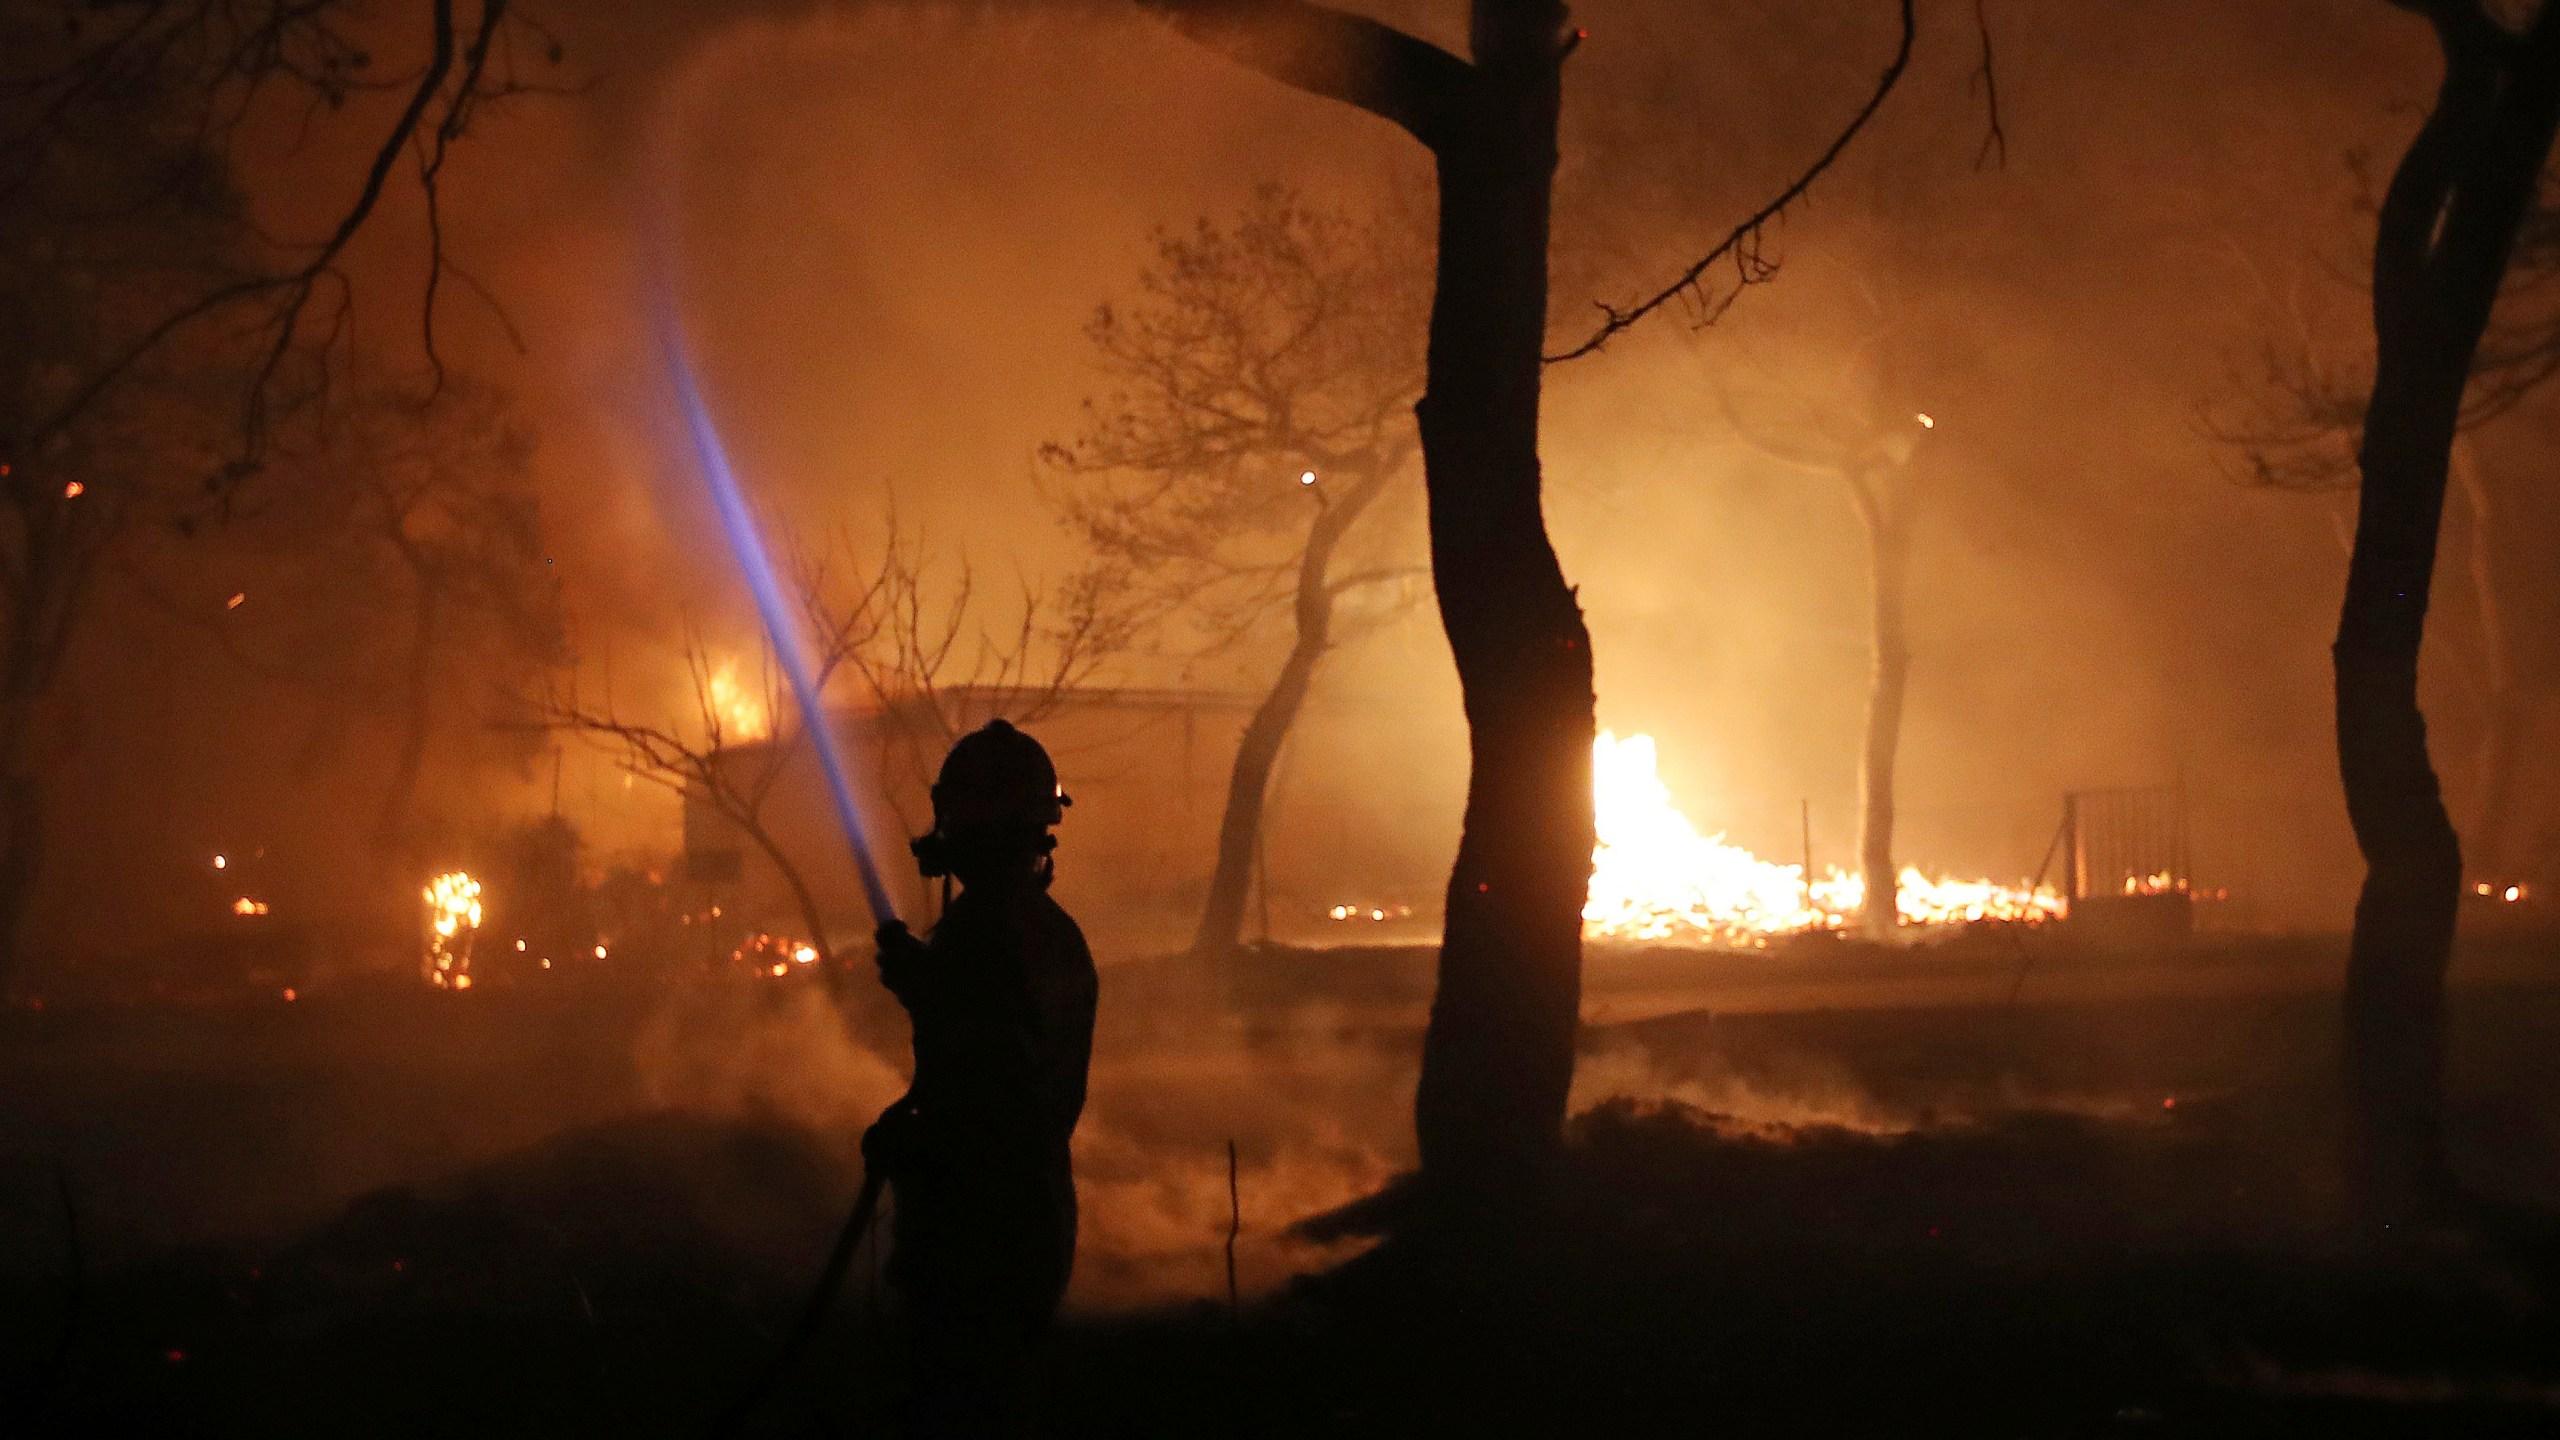 Greece_Forest_Fire_50504-159532.jpg78201345